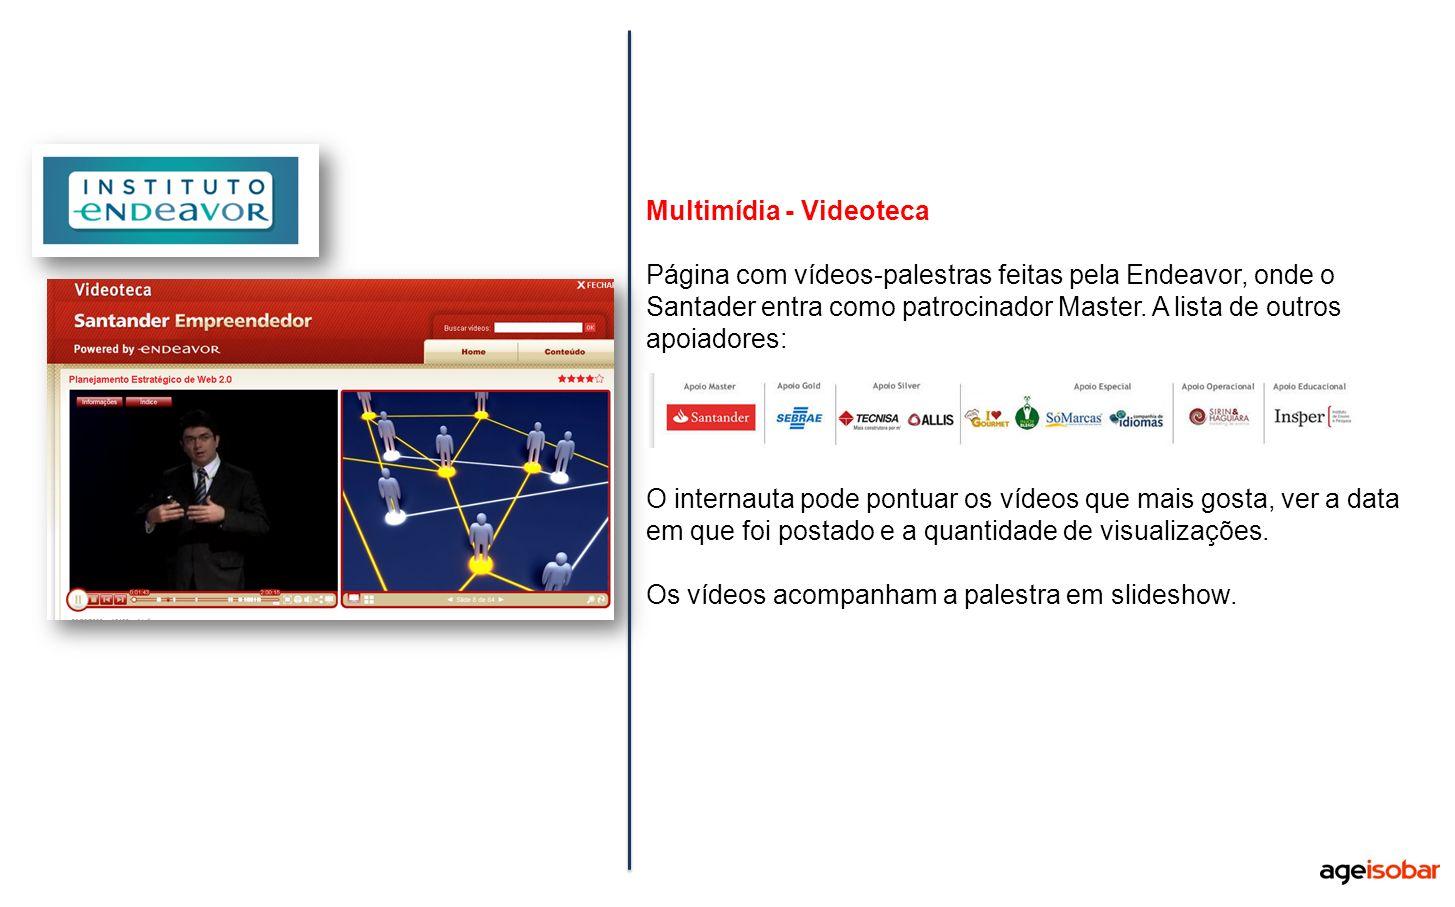 Multimídia - Videoteca Página com vídeos-palestras feitas pela Endeavor, onde o Santader entra como patrocinador Master. A lista de outros apoiadores: